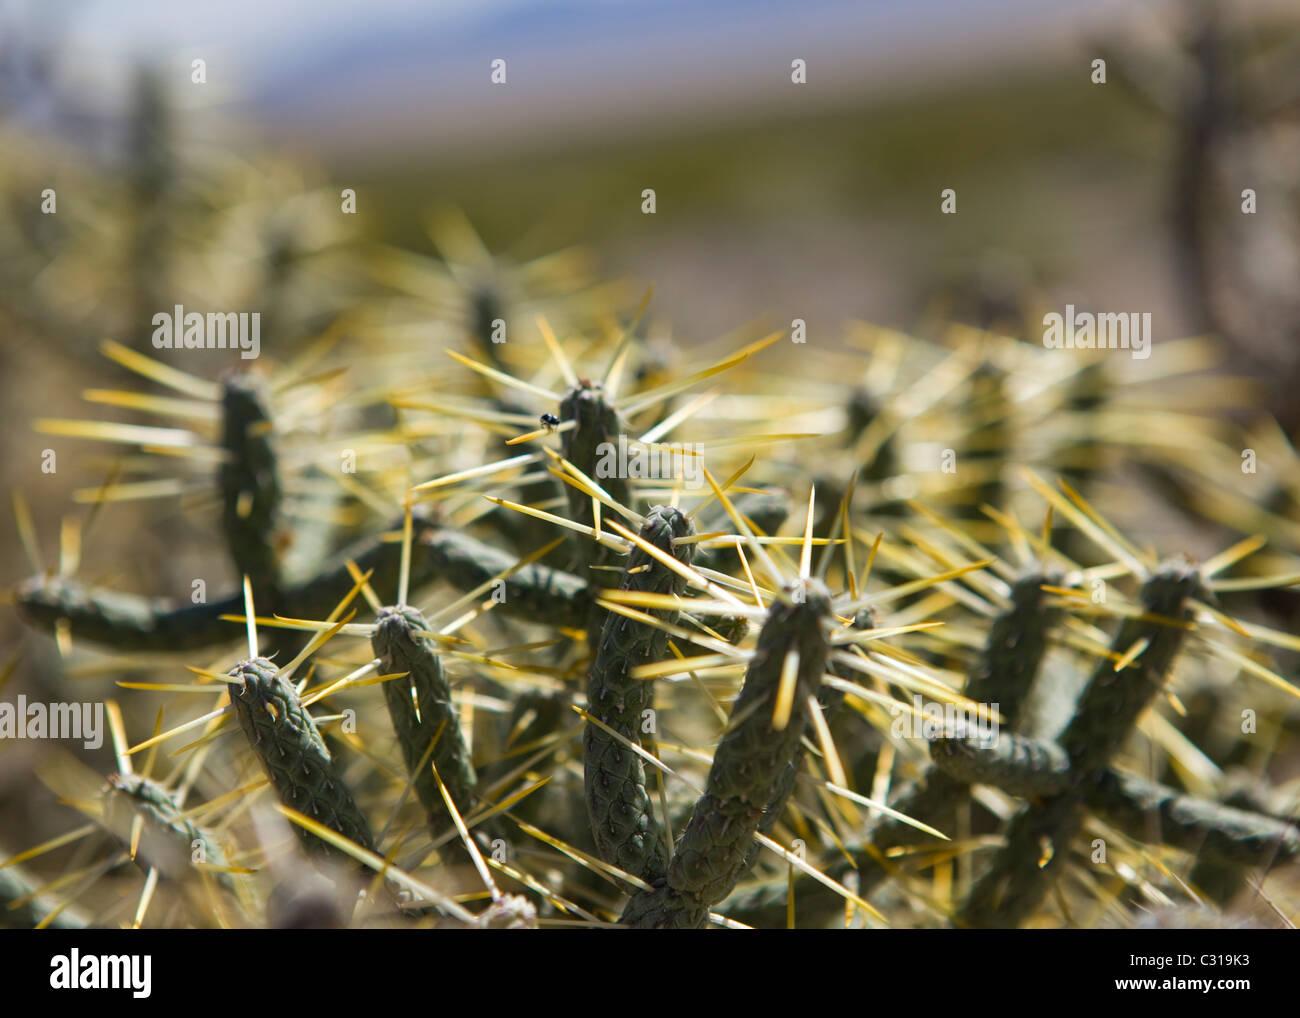 Pencil Cholla Cactus (Cylindropuntia ramosissima) - Mojave desert, California USA - Stock Image